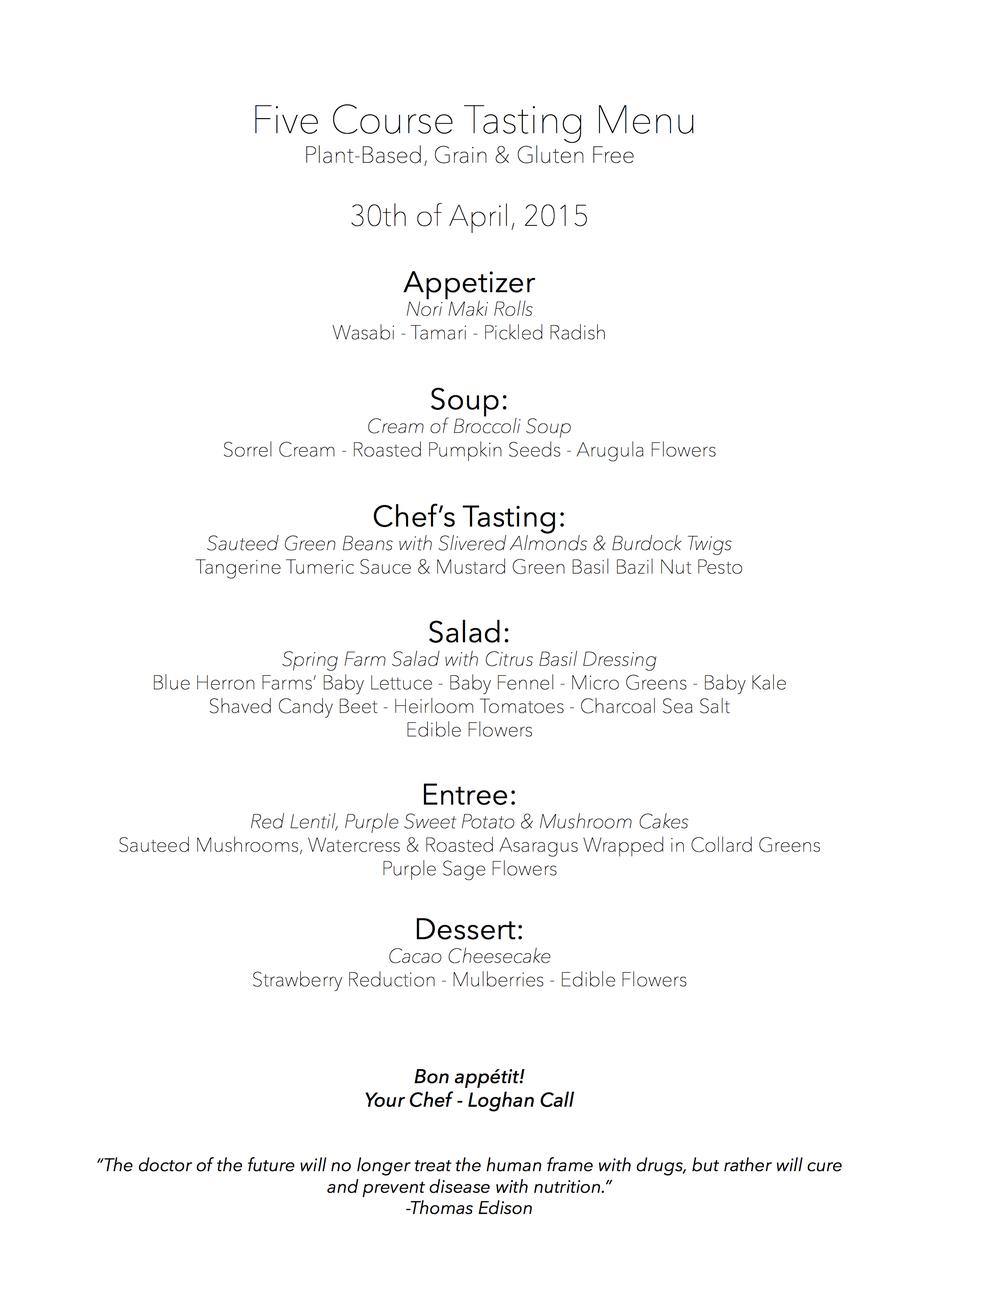 Chef's Tasting Menu - 4.30.15.jpg